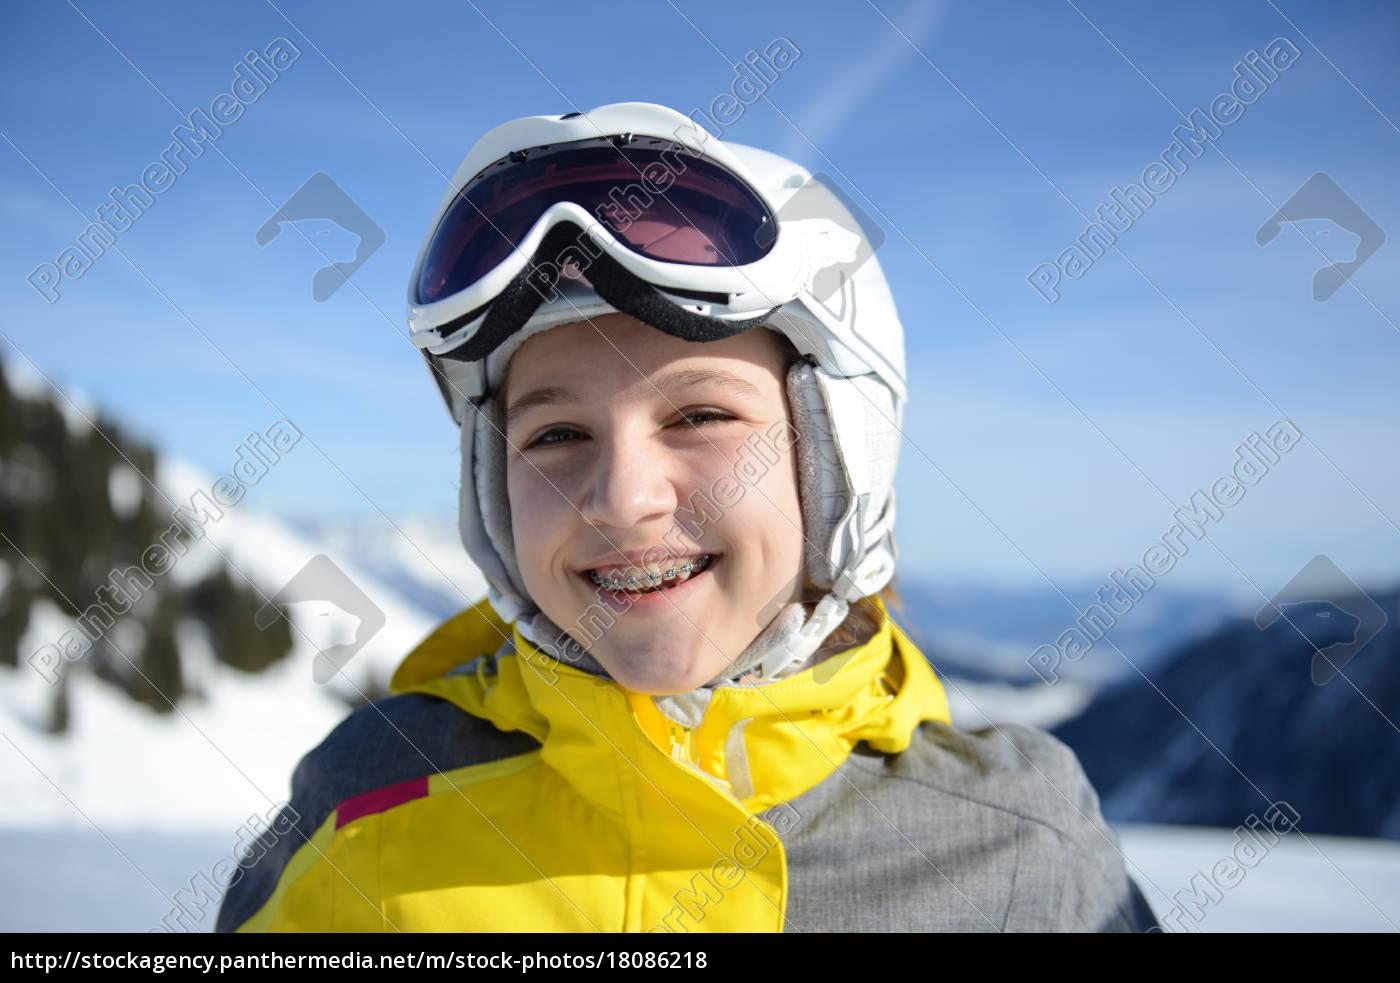 teenage, girl, smiling, on, skiing, holiday, - 18086218